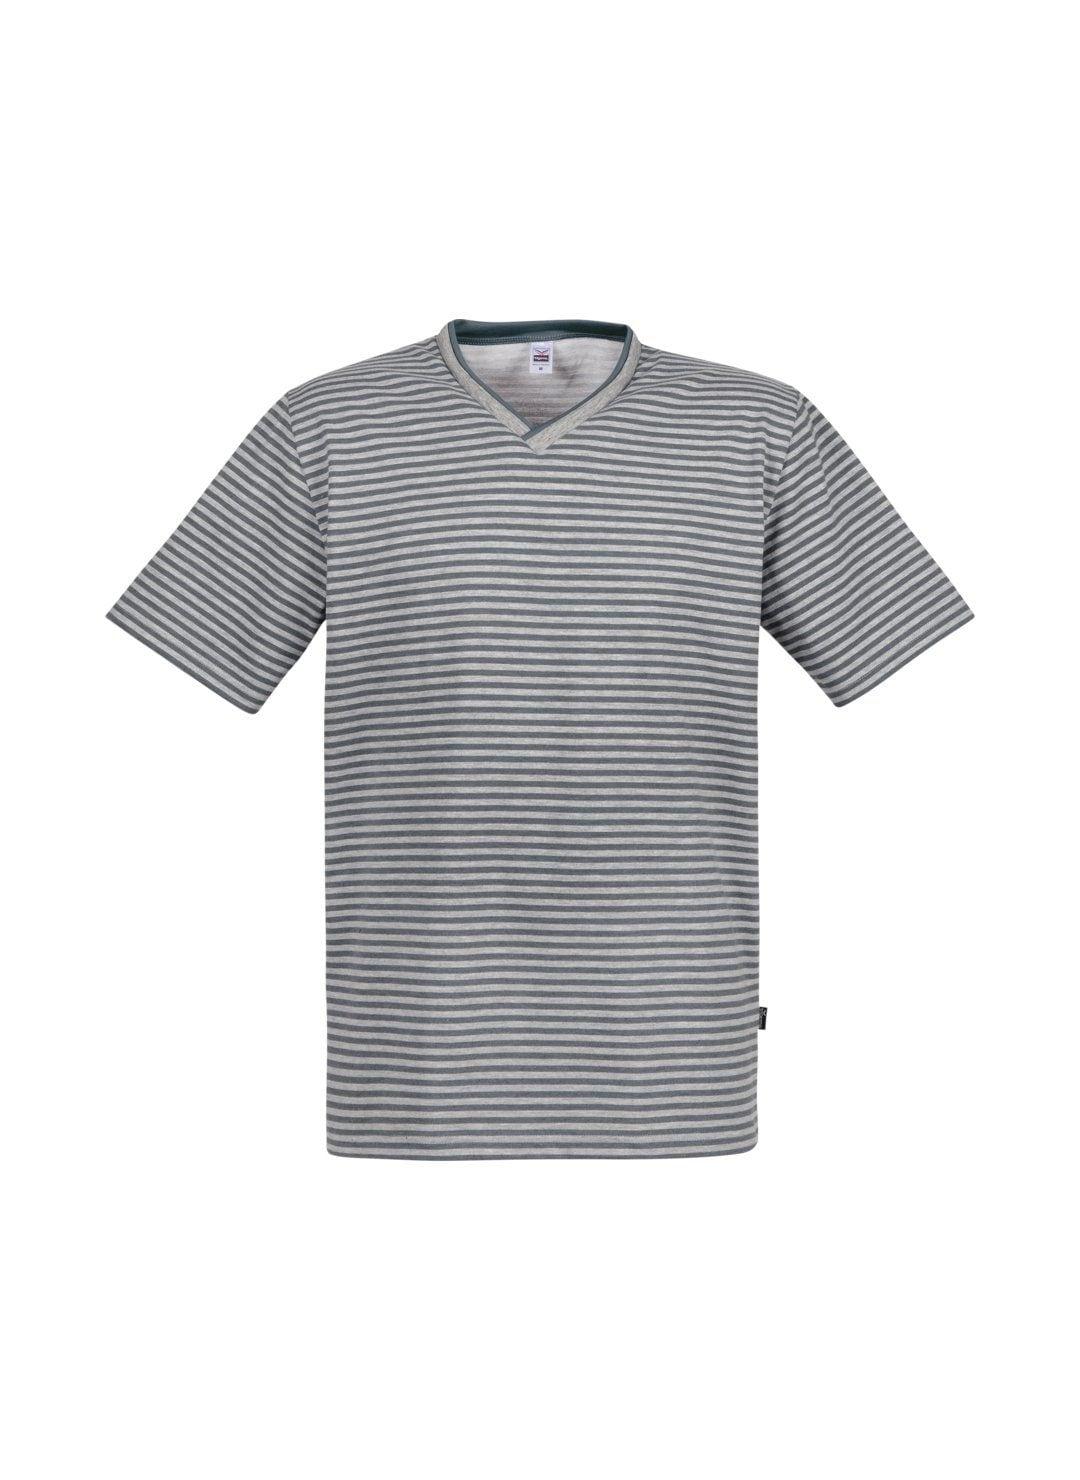 TRIGEMA V-Shirt DELUXE Baumwolle | Bekleidung > Shirts > Sonstige Shirts | Grau | Baumwolle - Polyester | Trigema